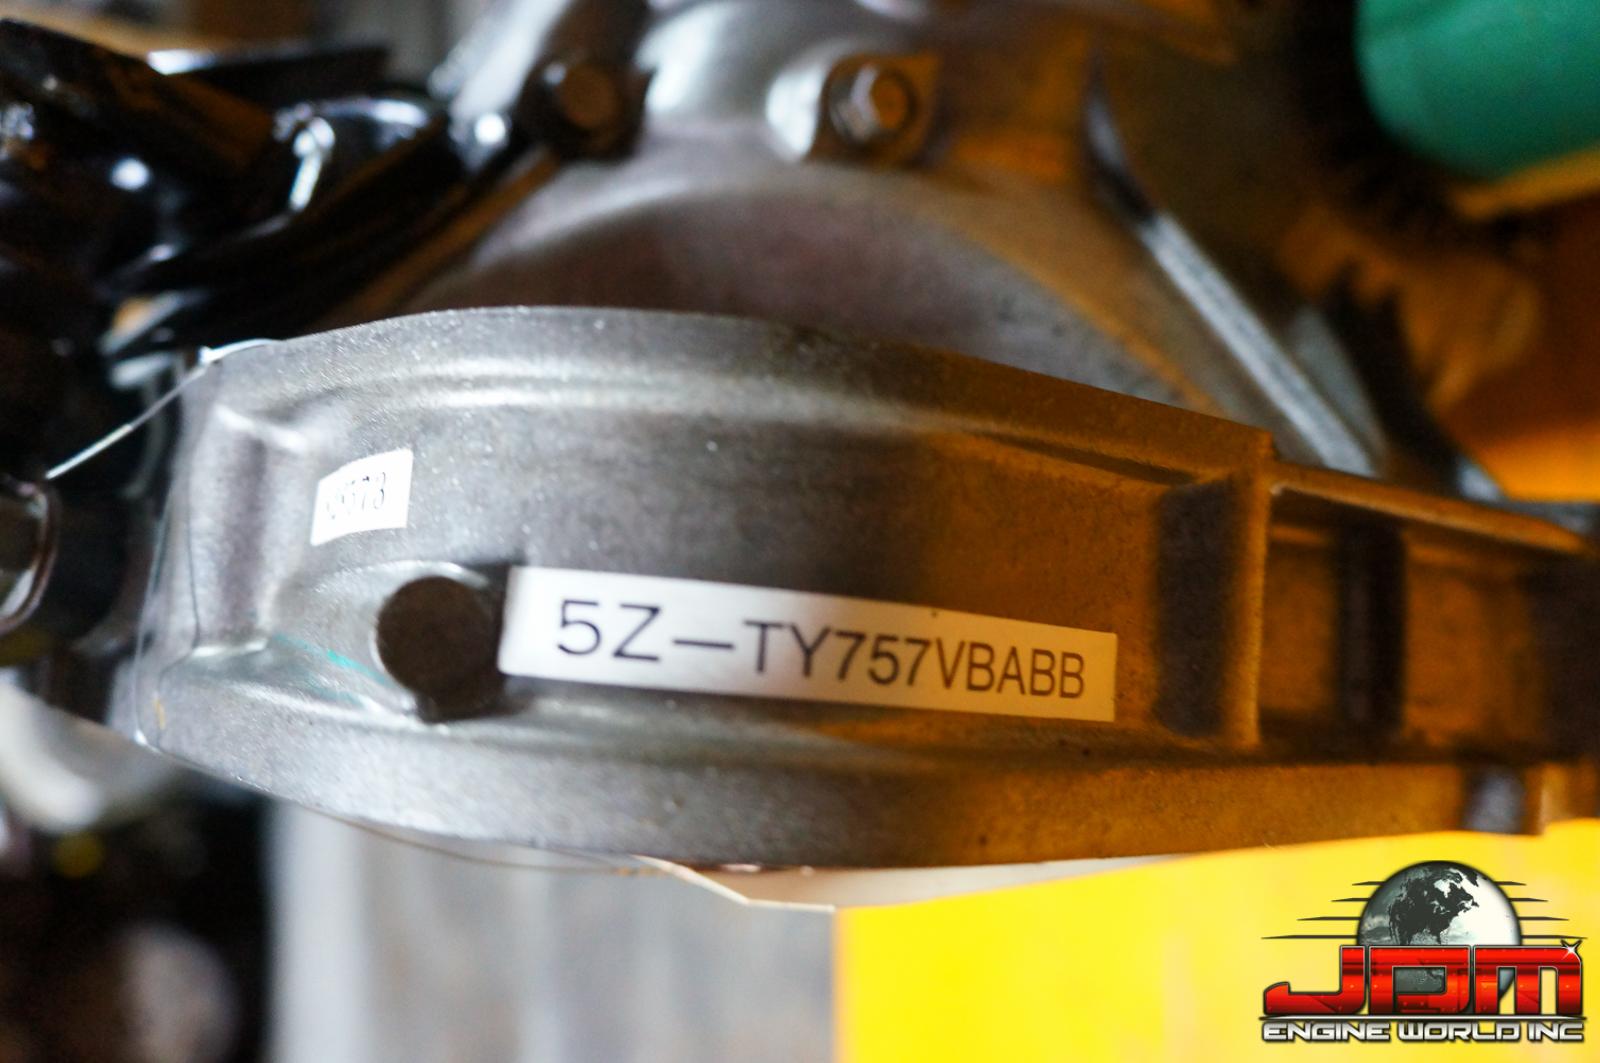 JDM EJ20-T LEGACY SPEC B 4.44 MANUAL TRANSMISSION